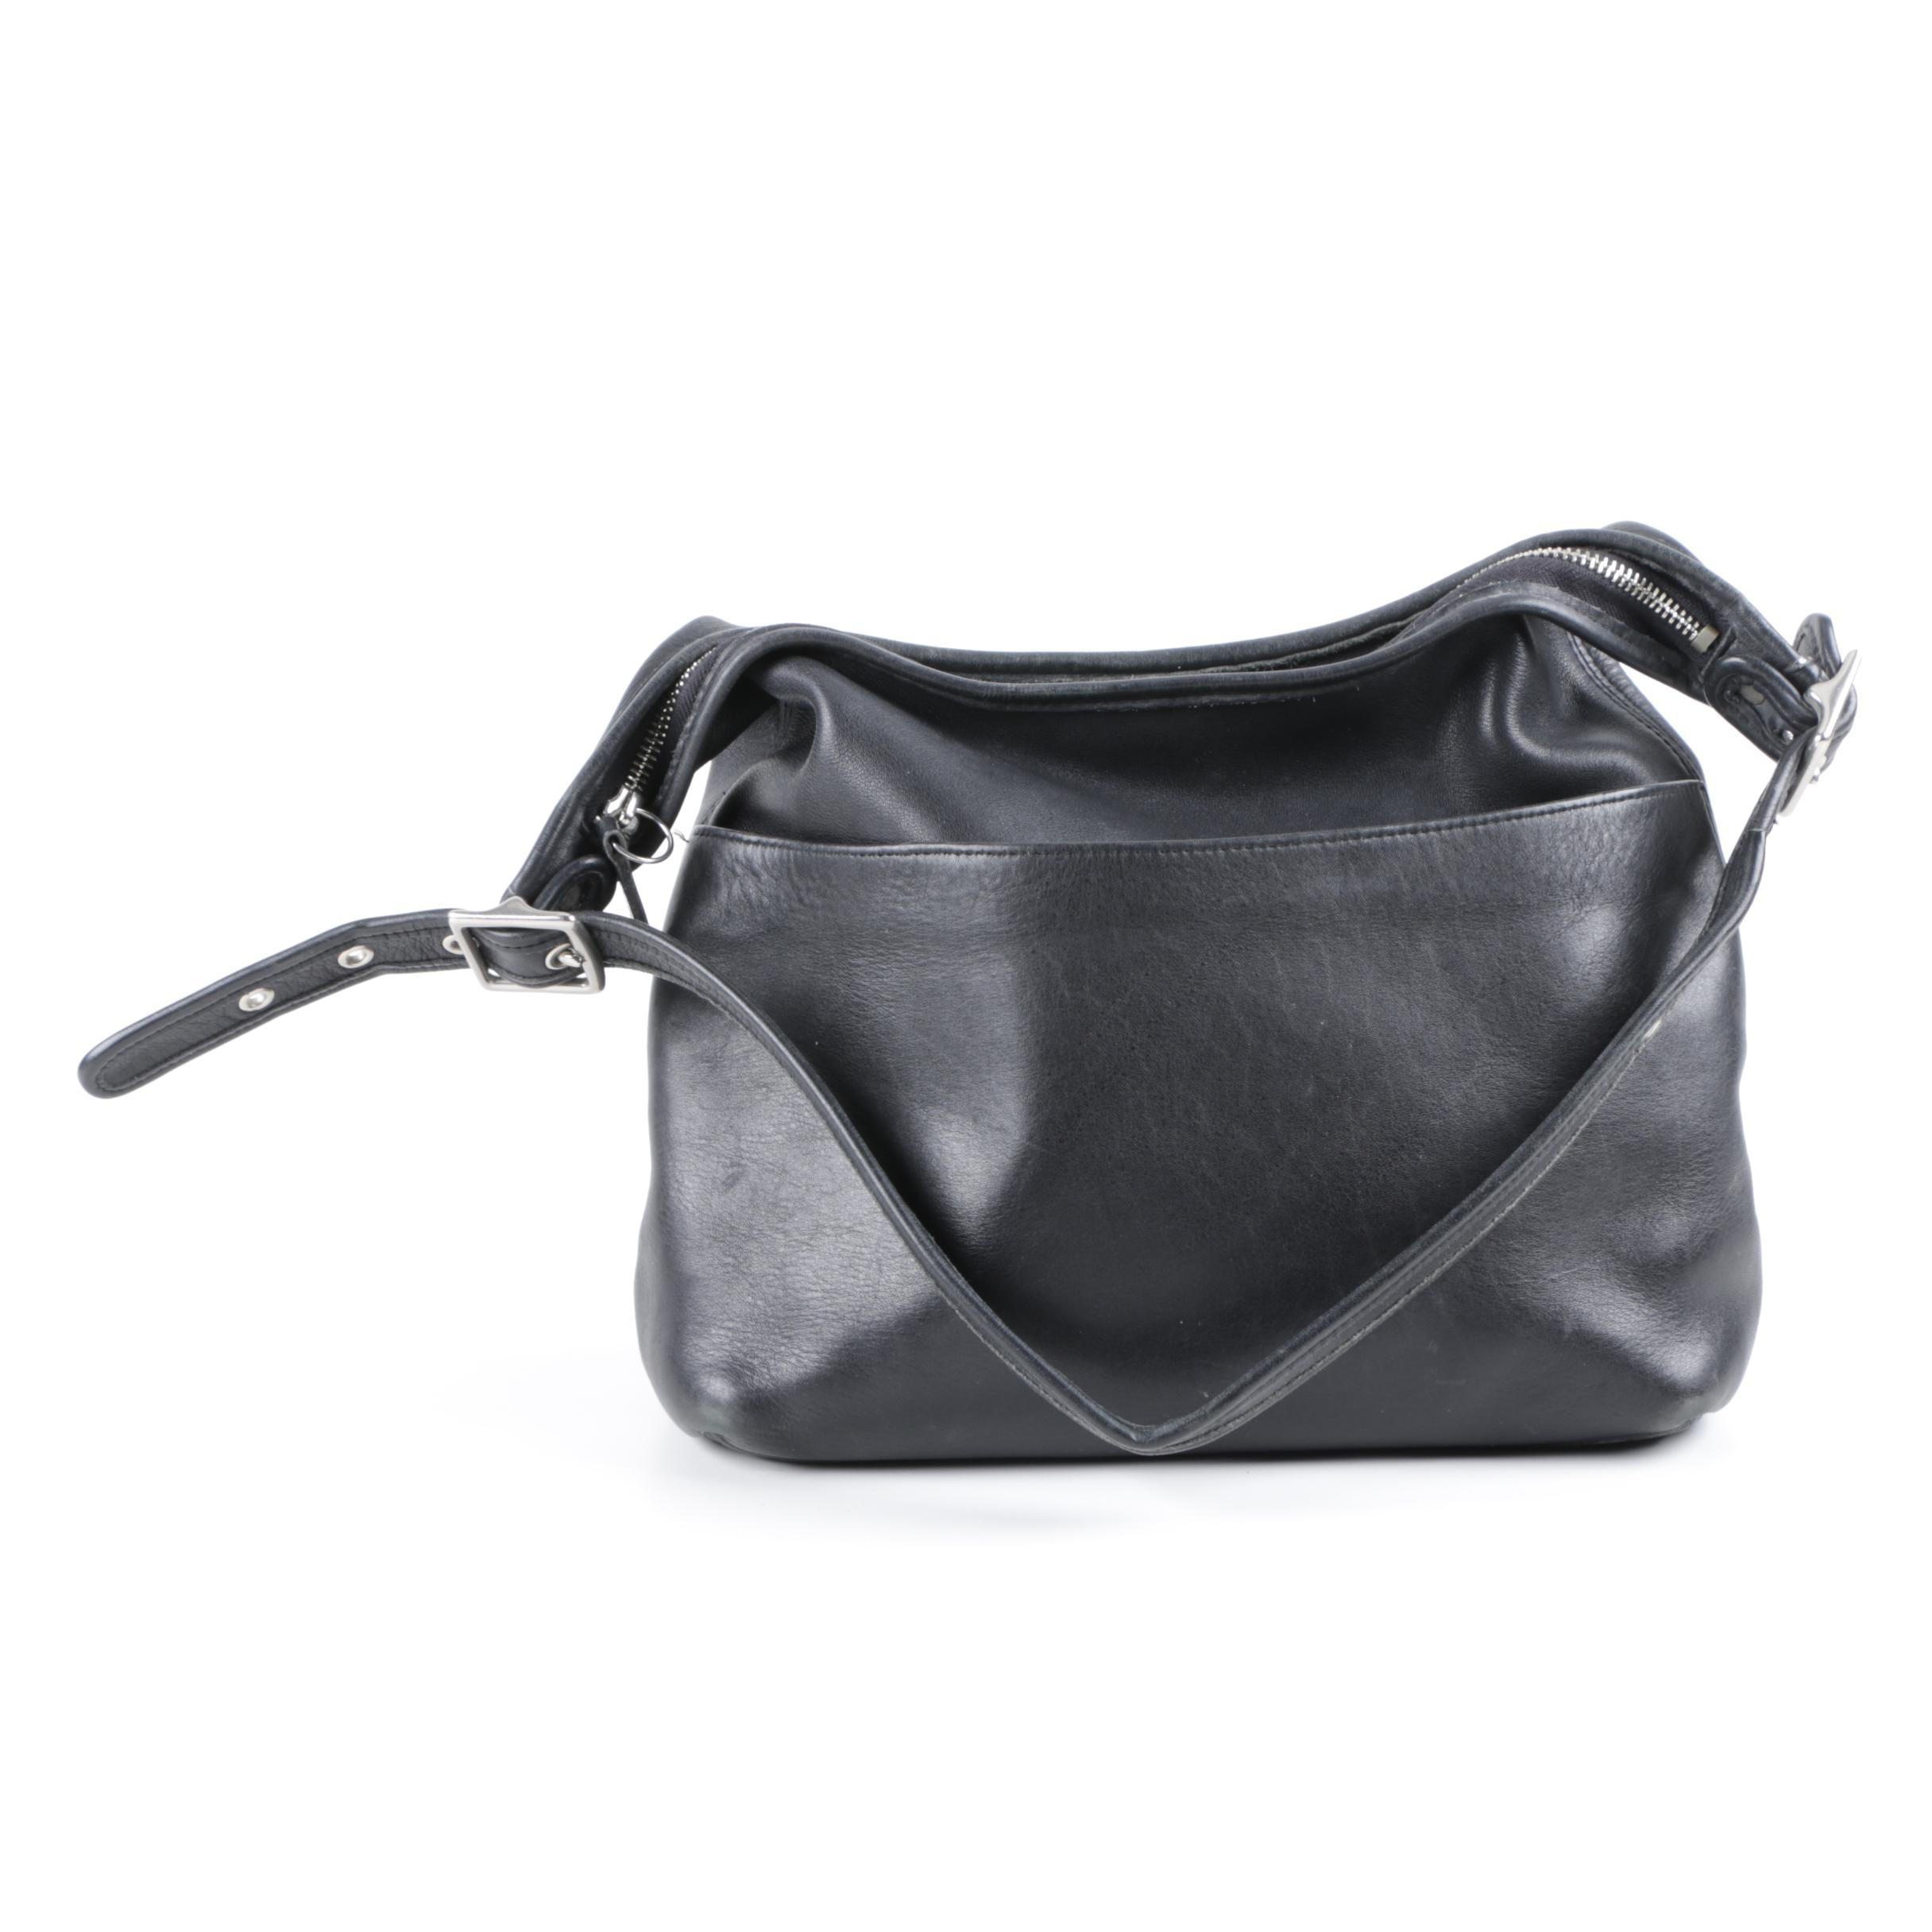 Coach Legacy Black Leather Hobo Handbag